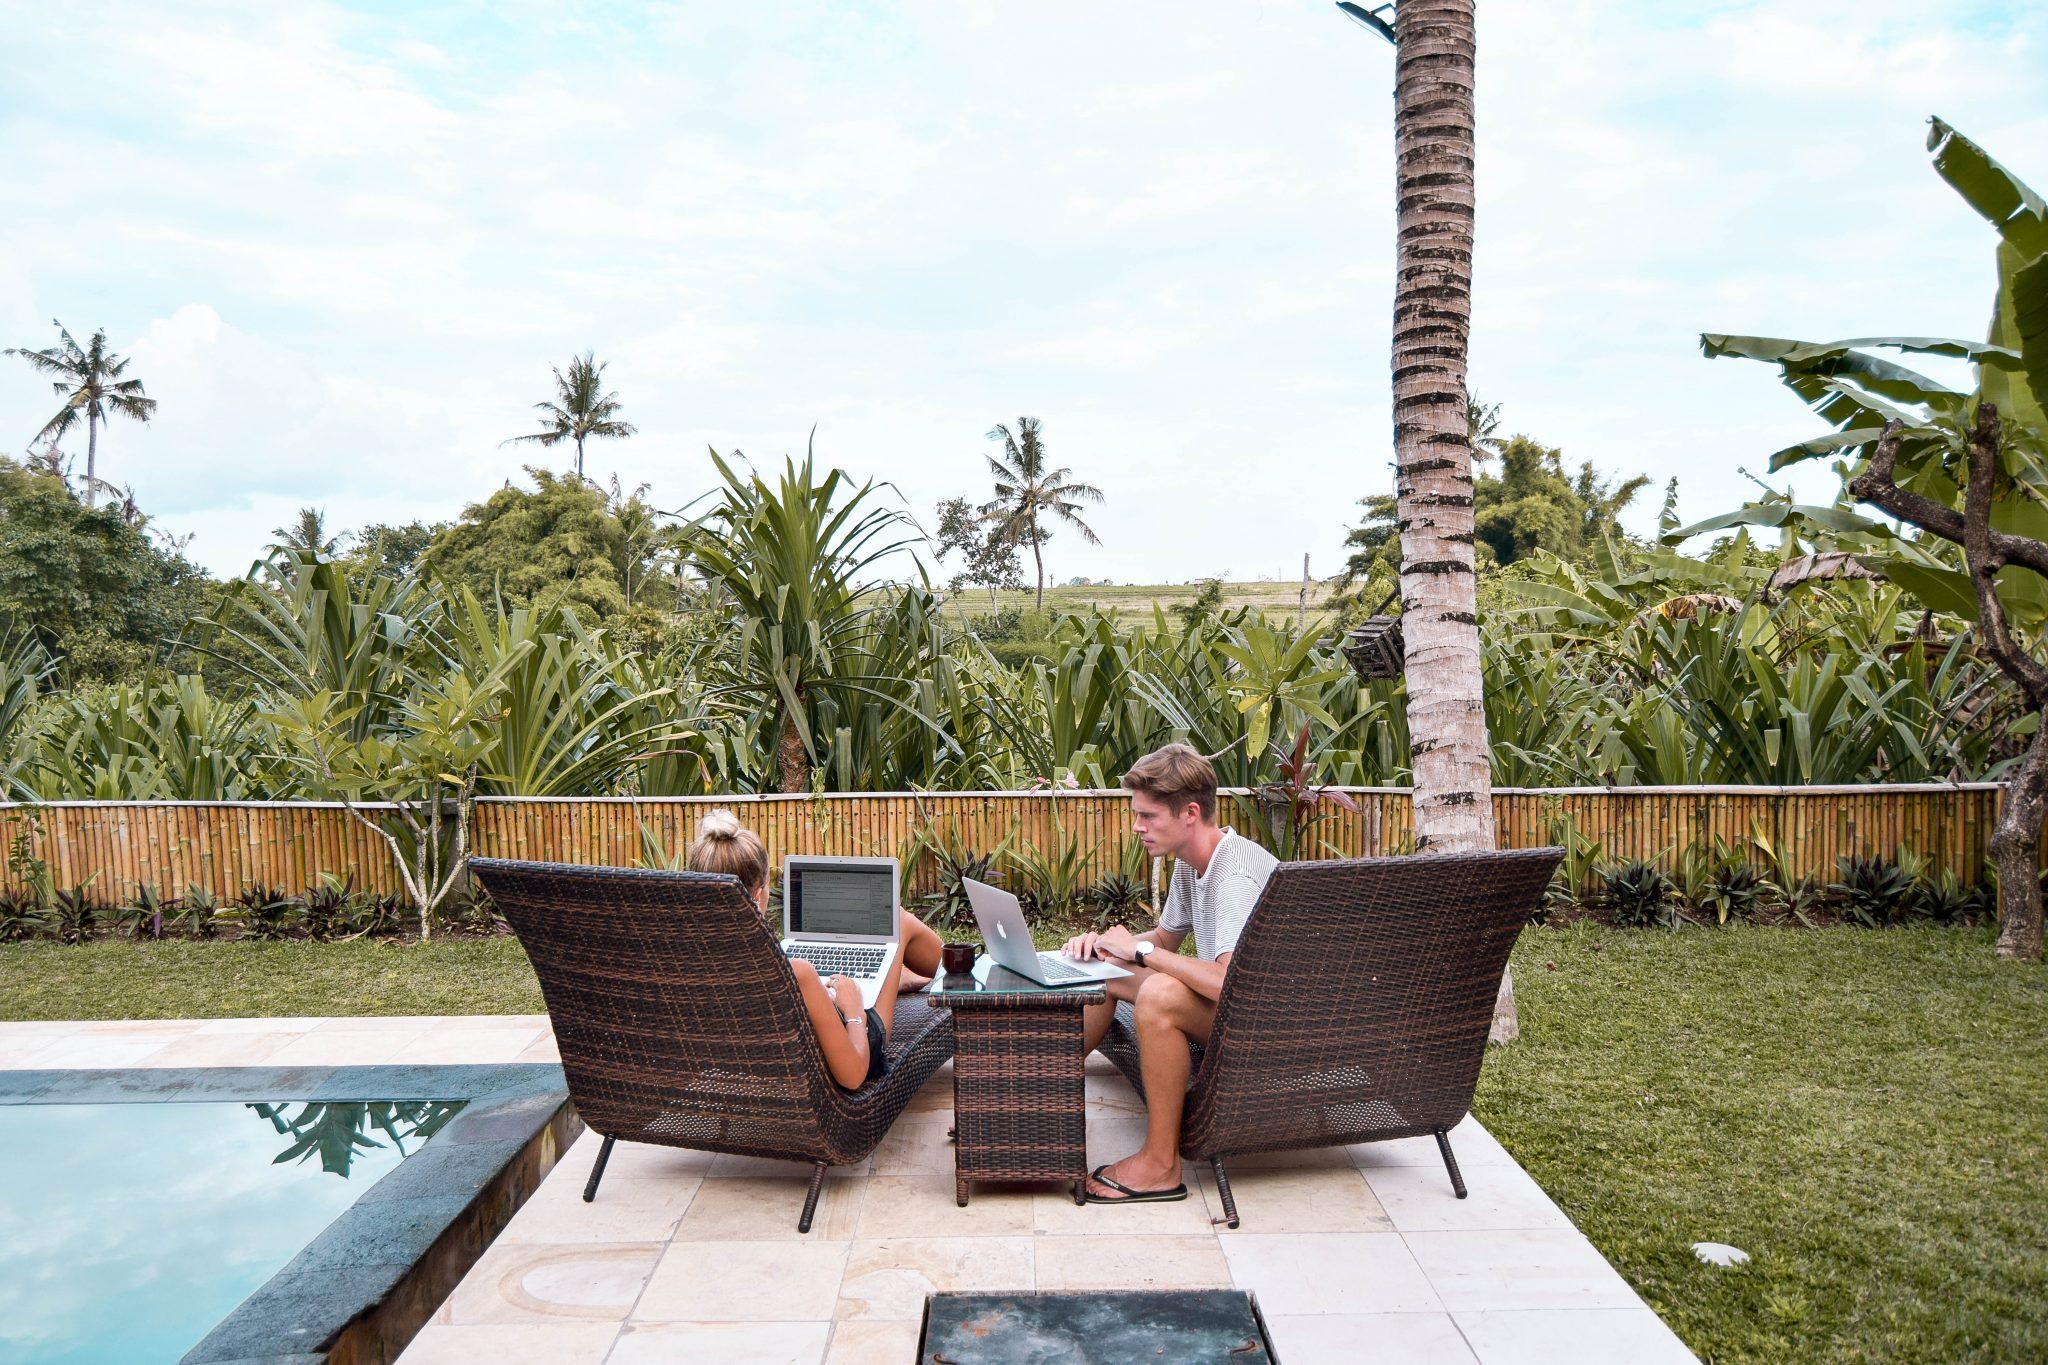 Wanderers & Warriors - Charlie & Lauren UK Travel Couple - How To Start A Travel Blog